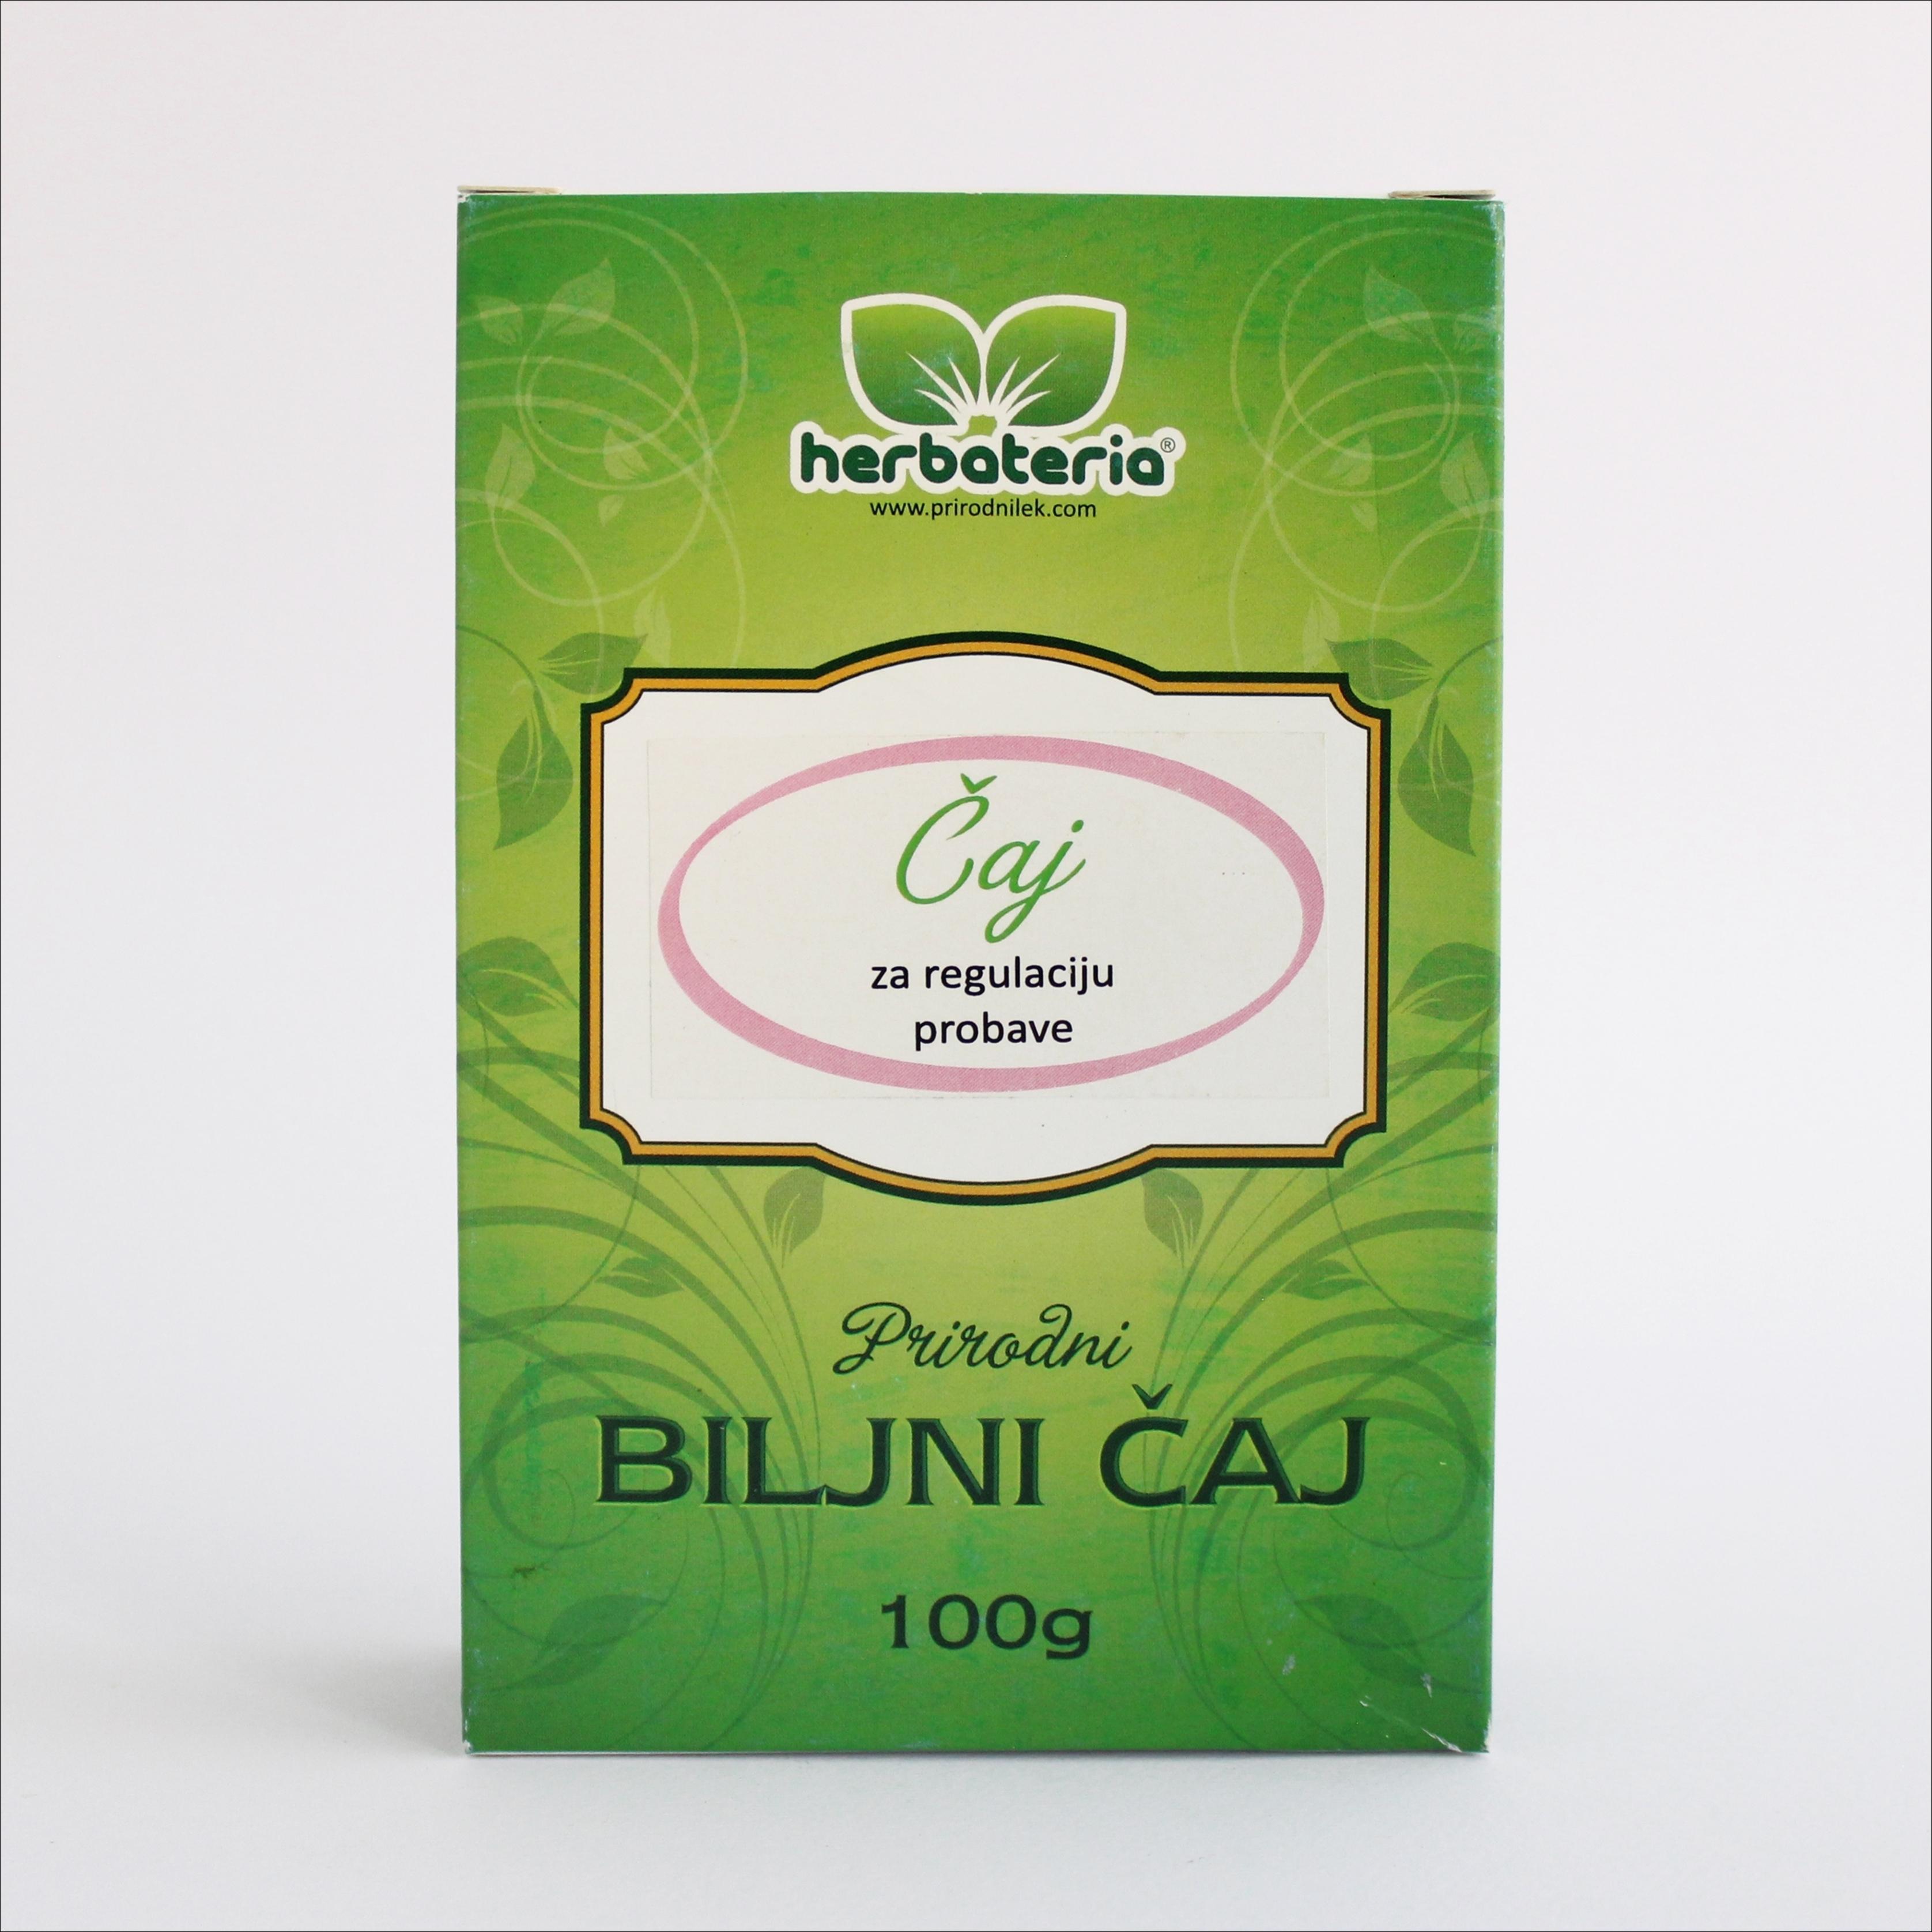 Herbateria - Čaj za regulaciju probave 00078